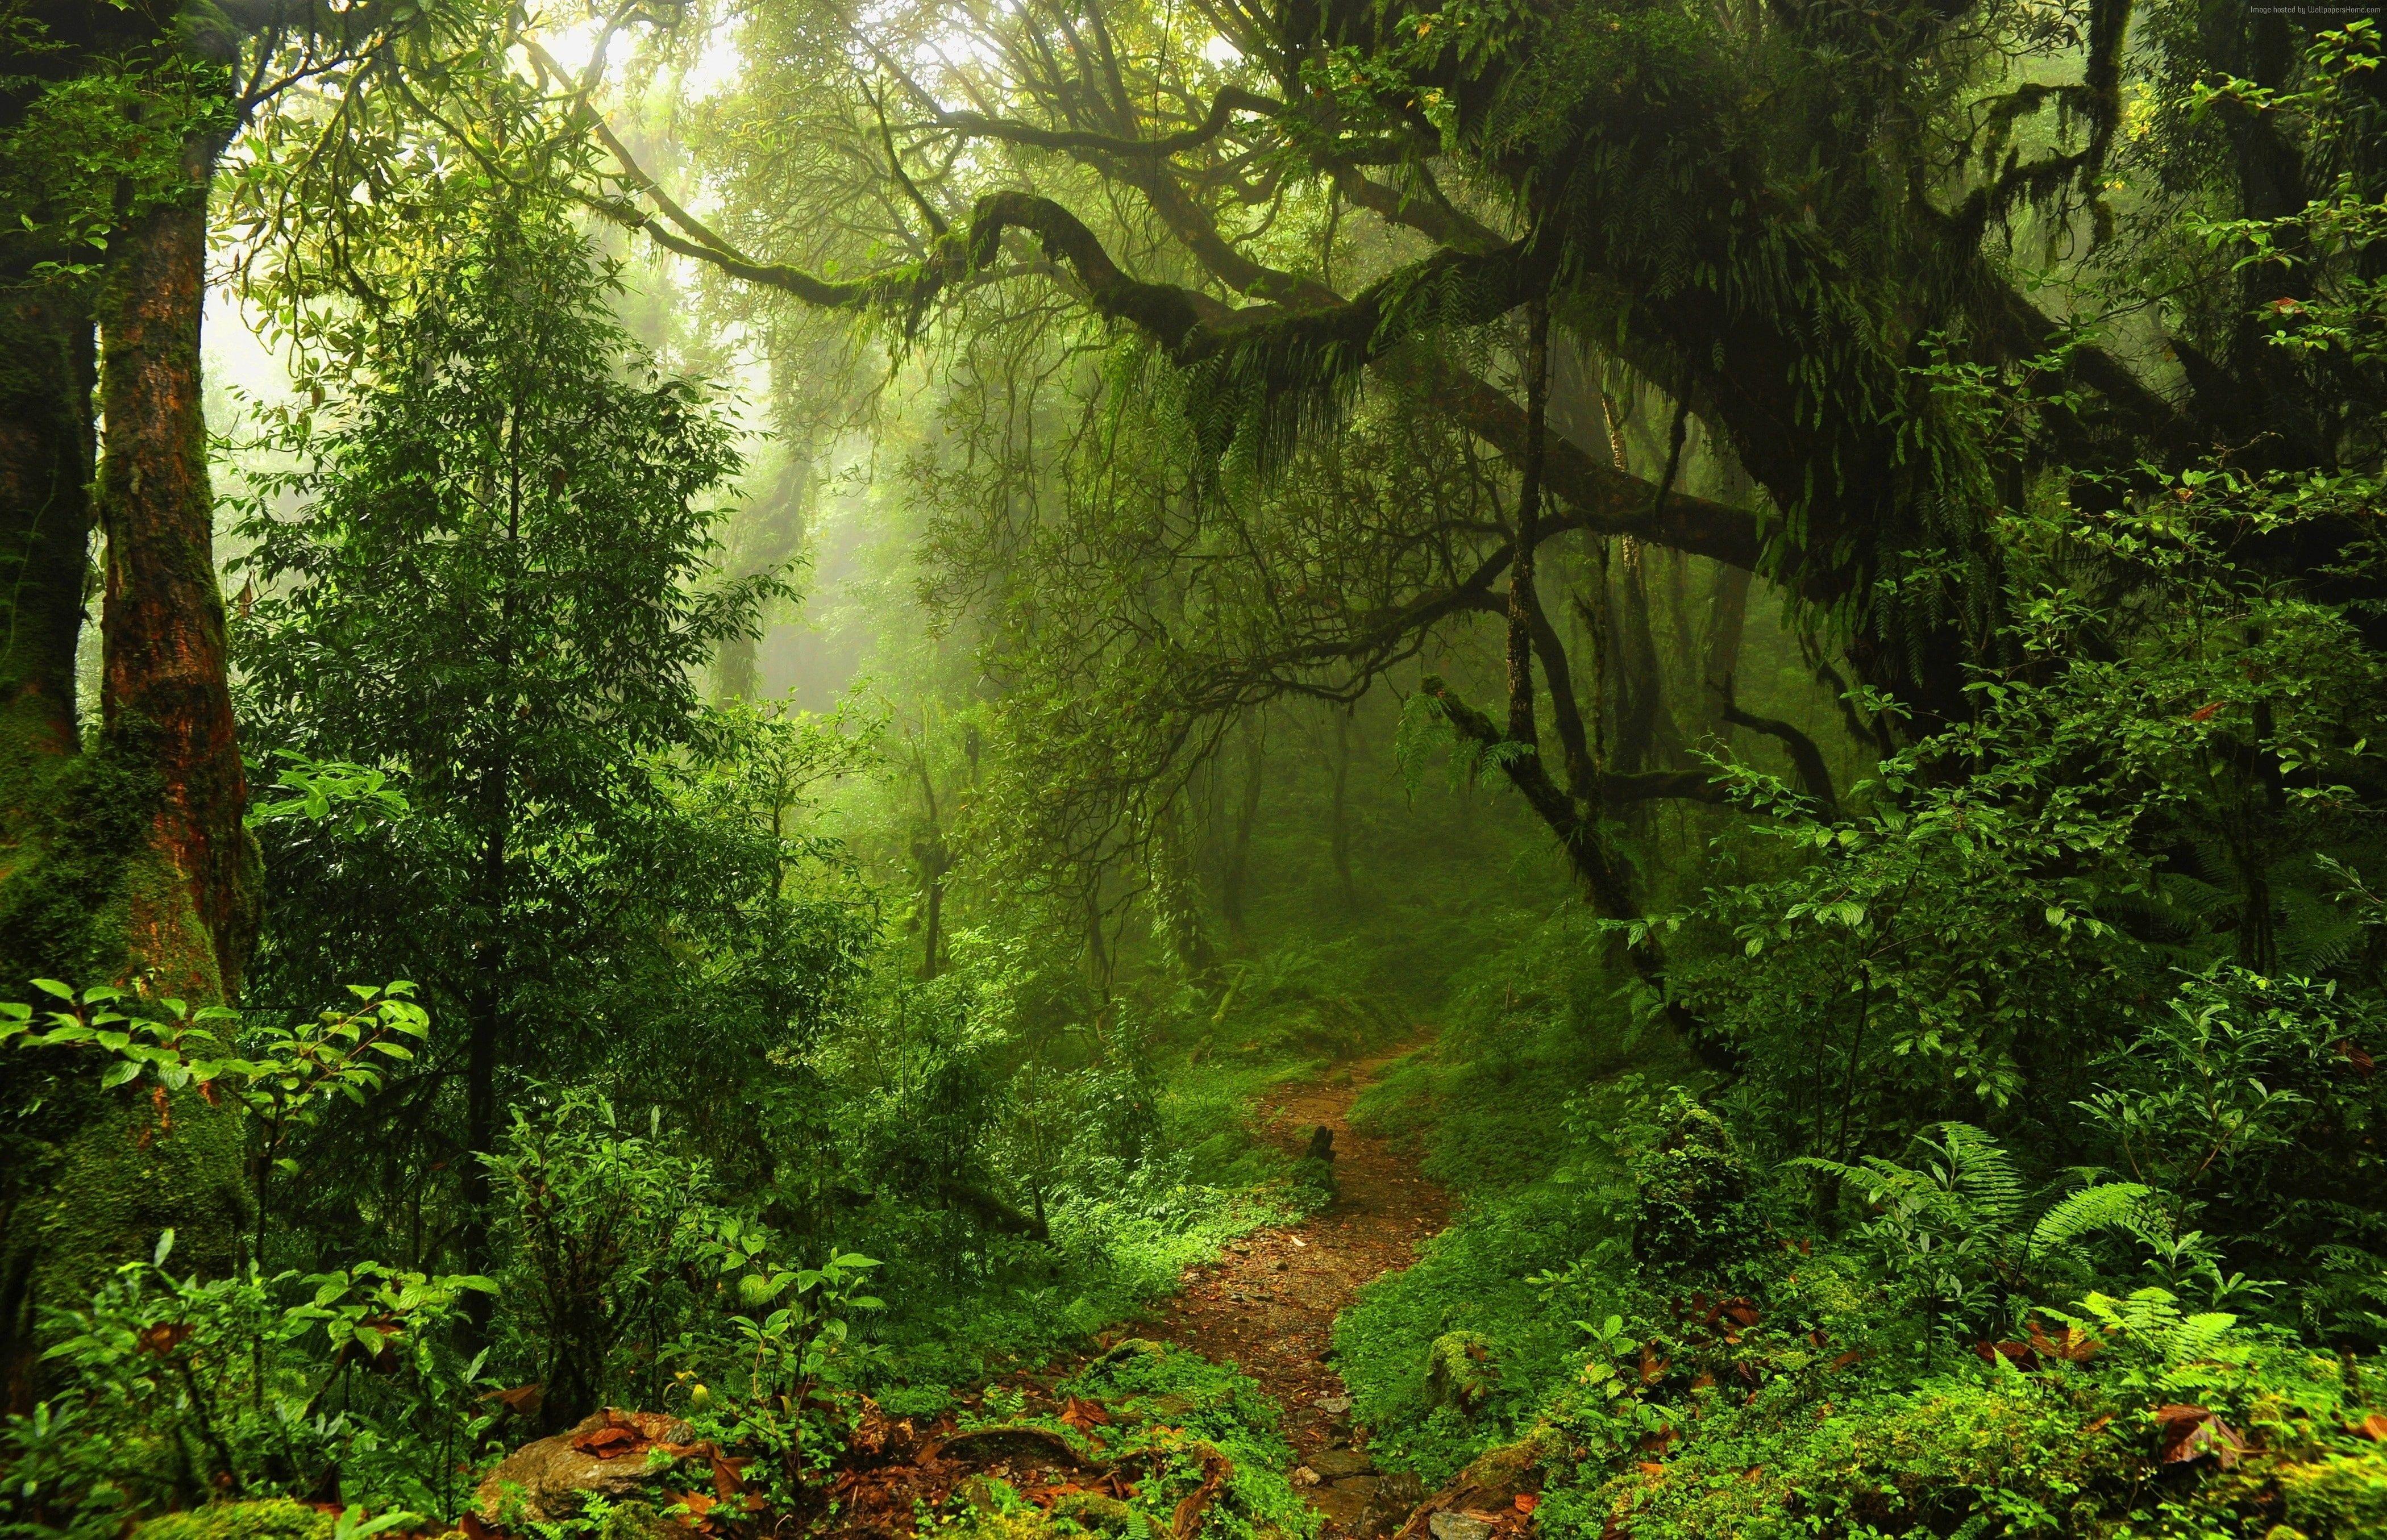 Trees Leaves 4k Summer Forest Grass Green 5k 4k Wallpaper Hdwallpaper Desktop In 2021 Landscape Oil Painting Landscape Photo